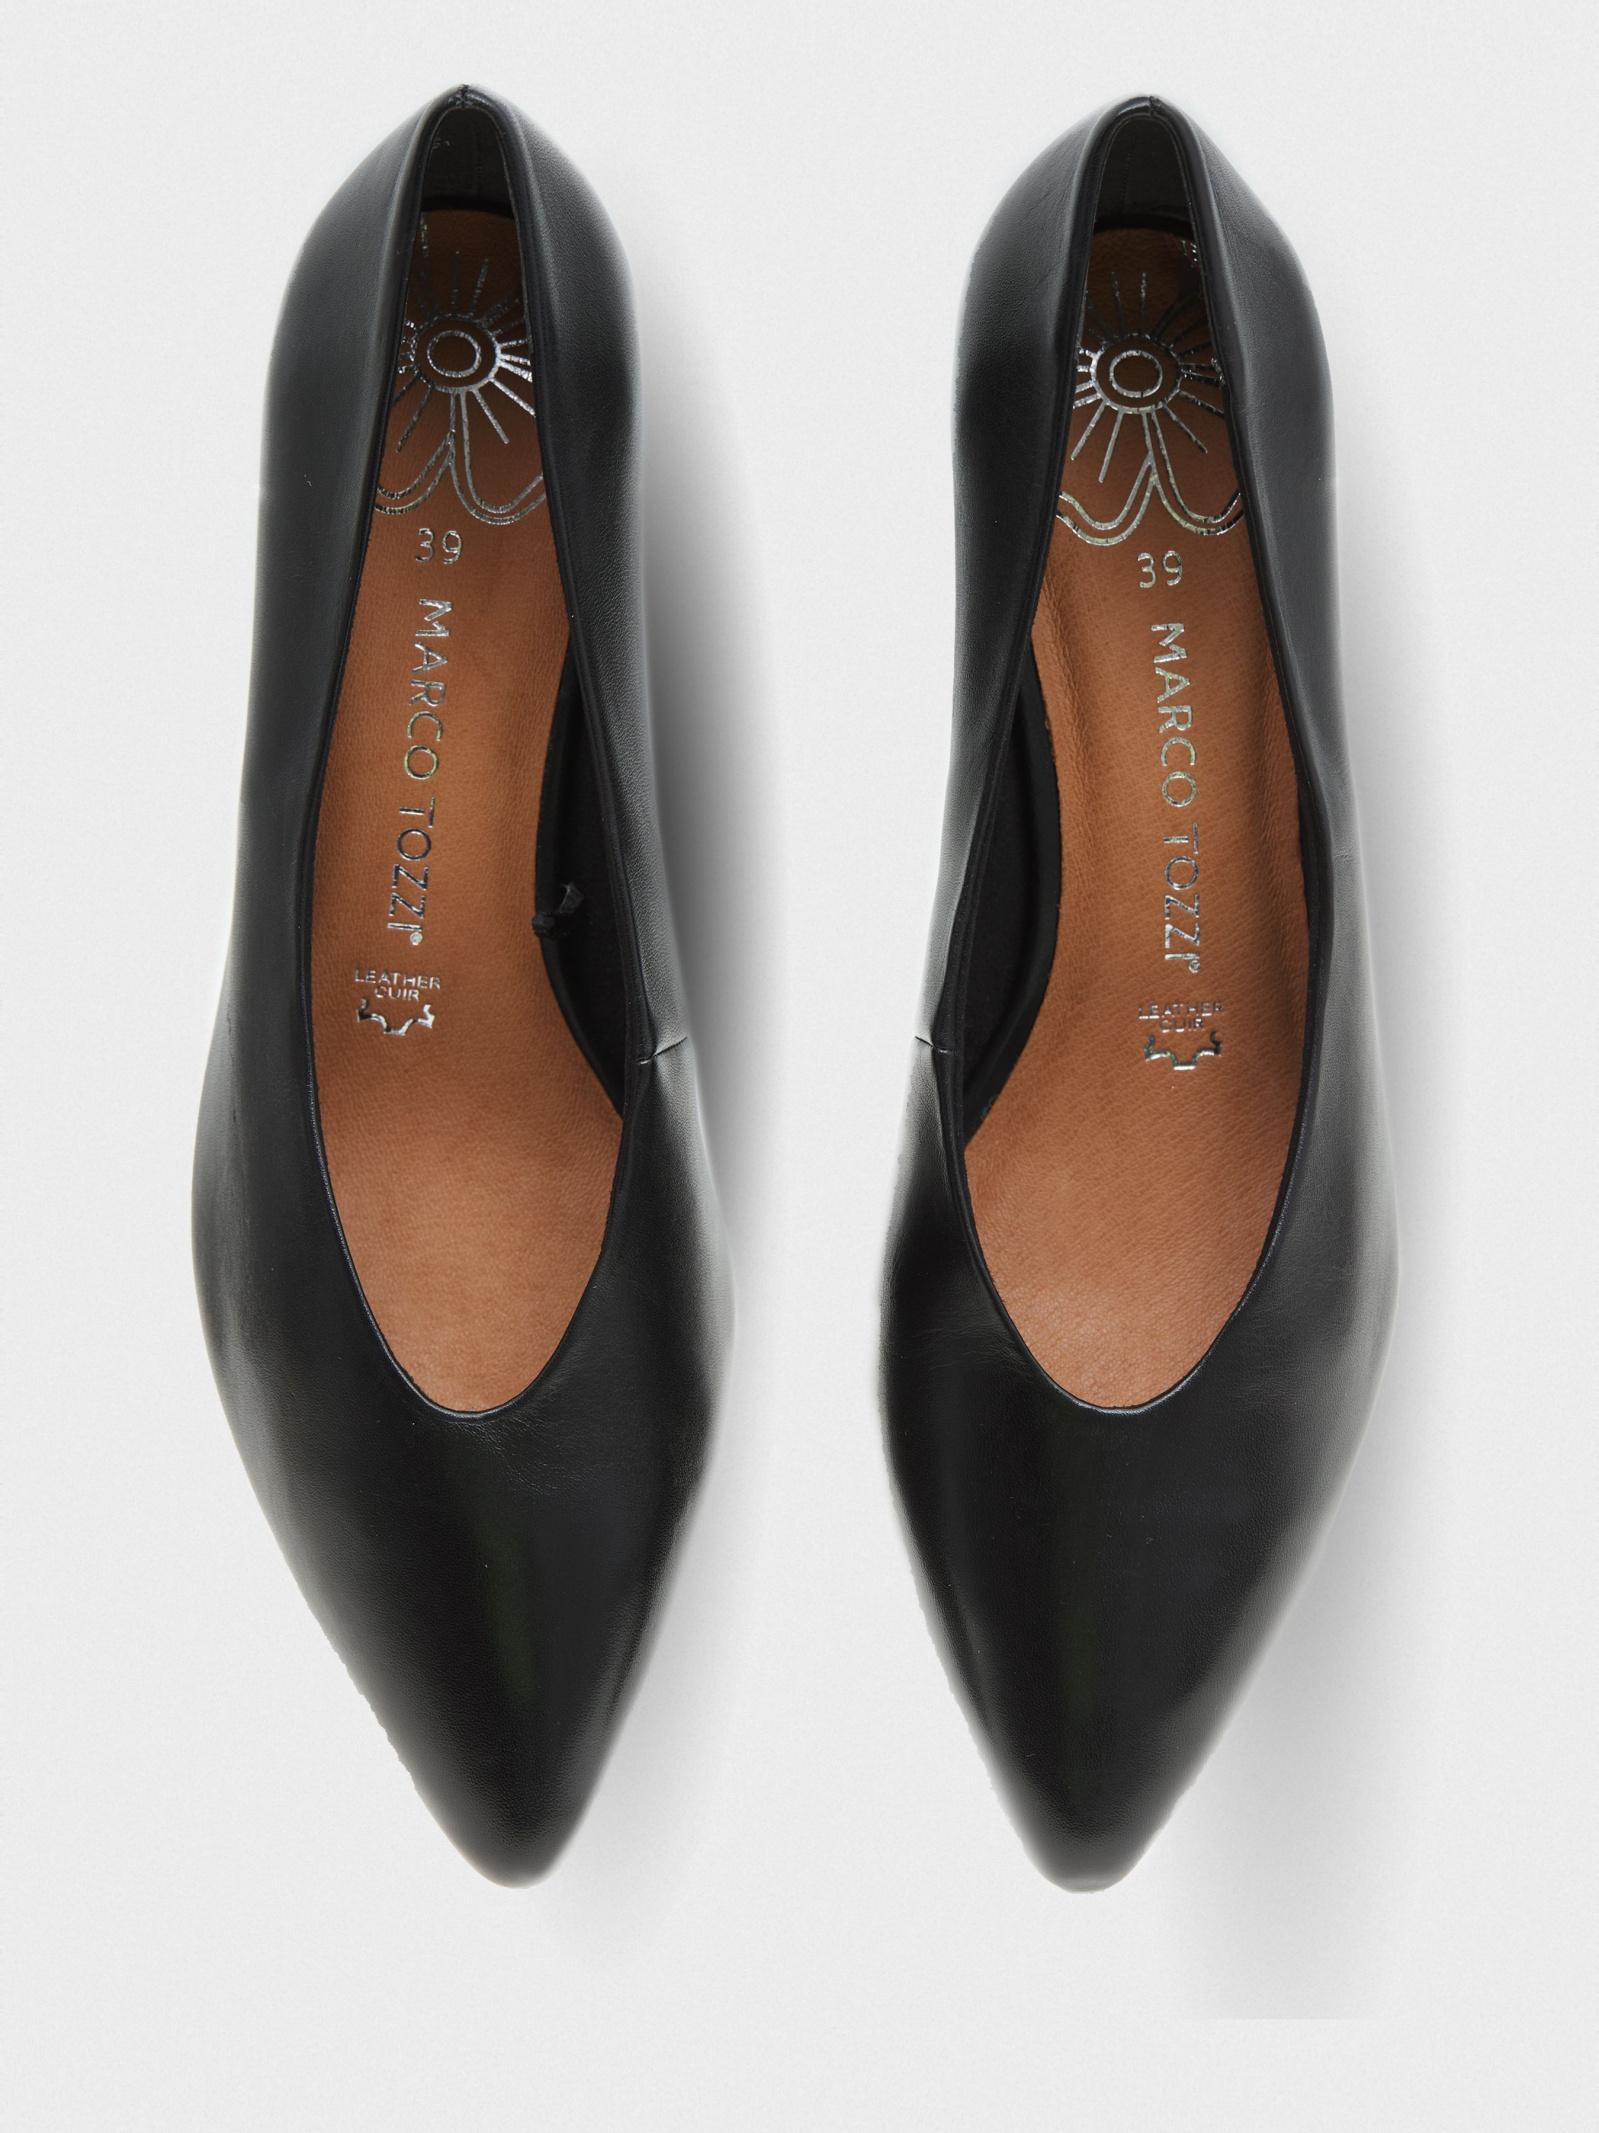 Туфли женские Marco Tozzi 3H310 размерная сетка обуви, 2017